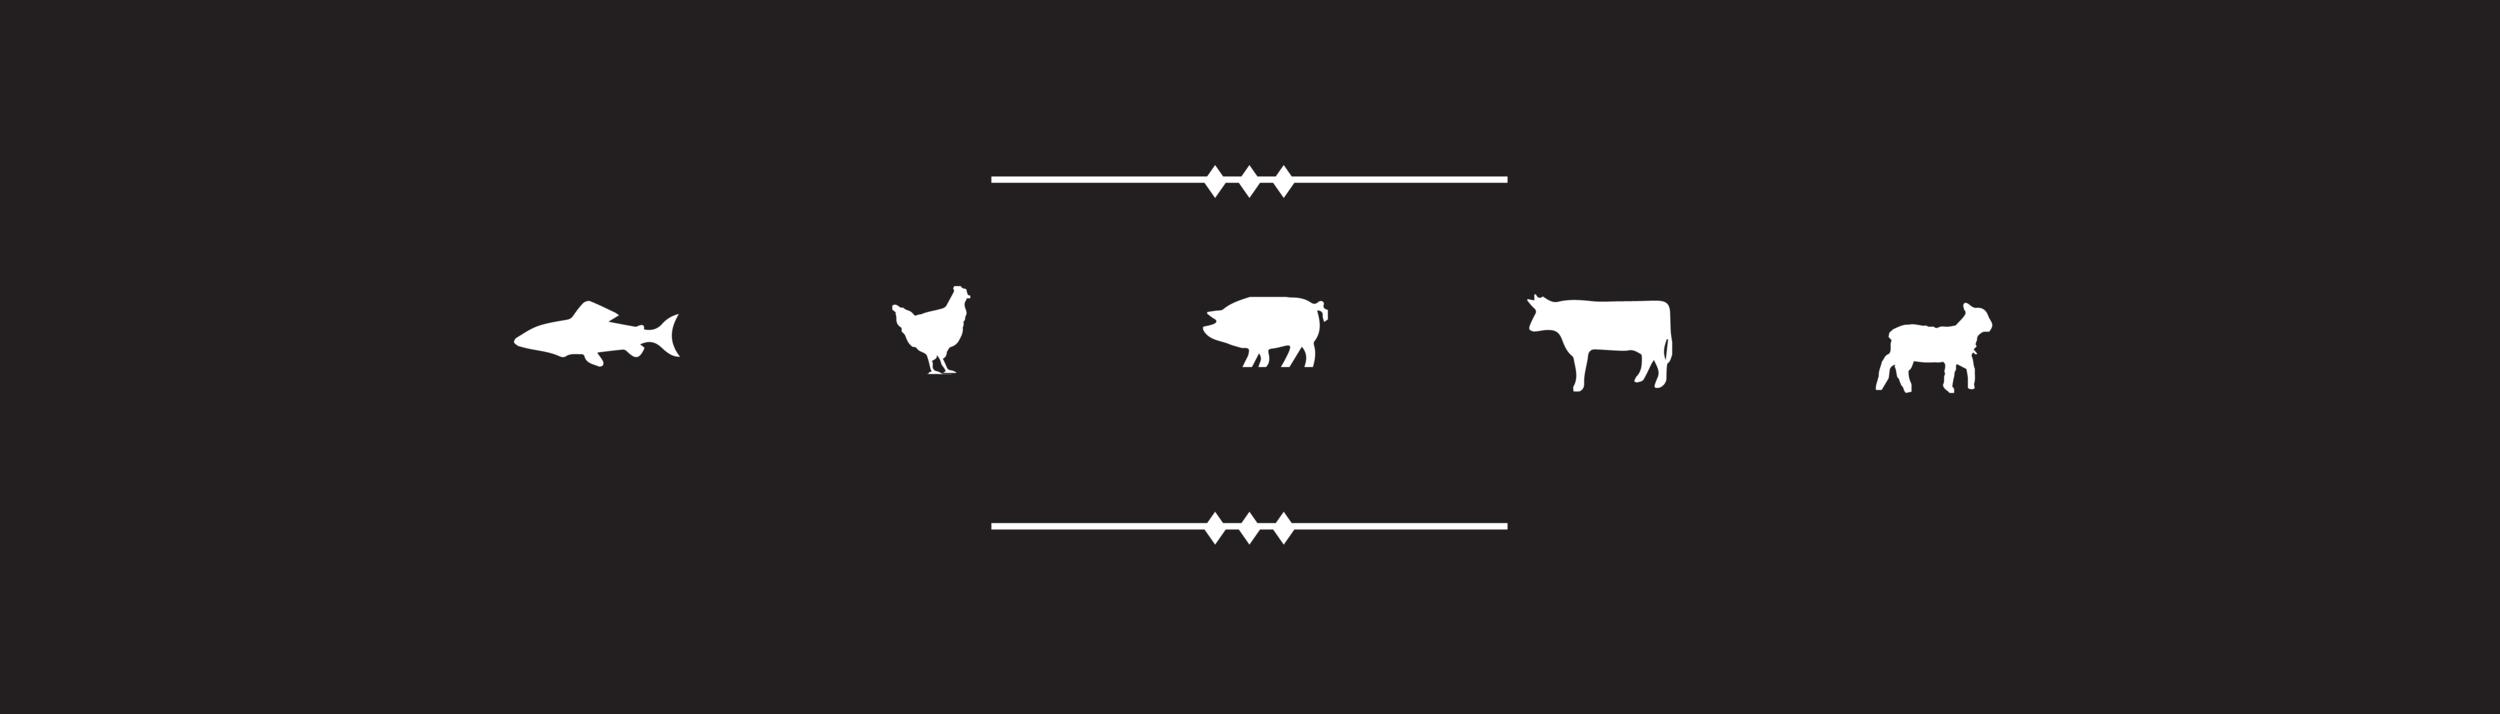 Grass Brandl Restaurant Icons-02.png